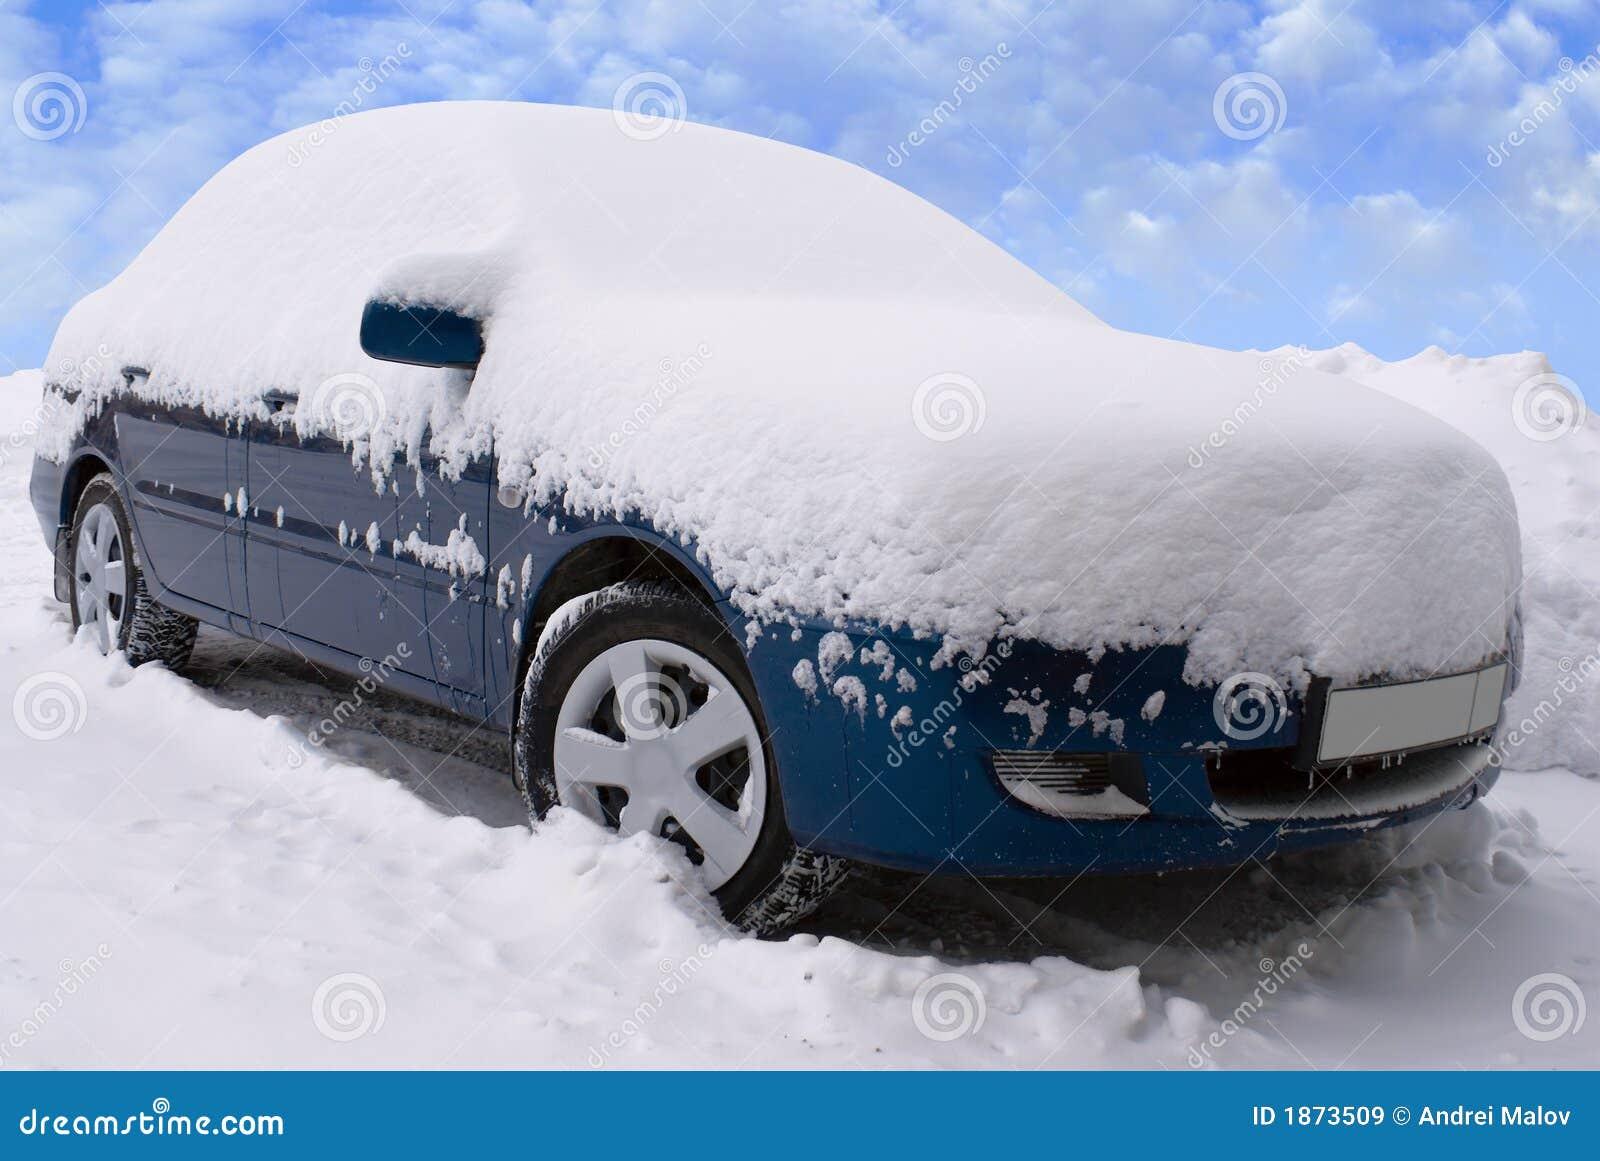 car under snow stock image image of outdoor engine fall 1873509. Black Bedroom Furniture Sets. Home Design Ideas